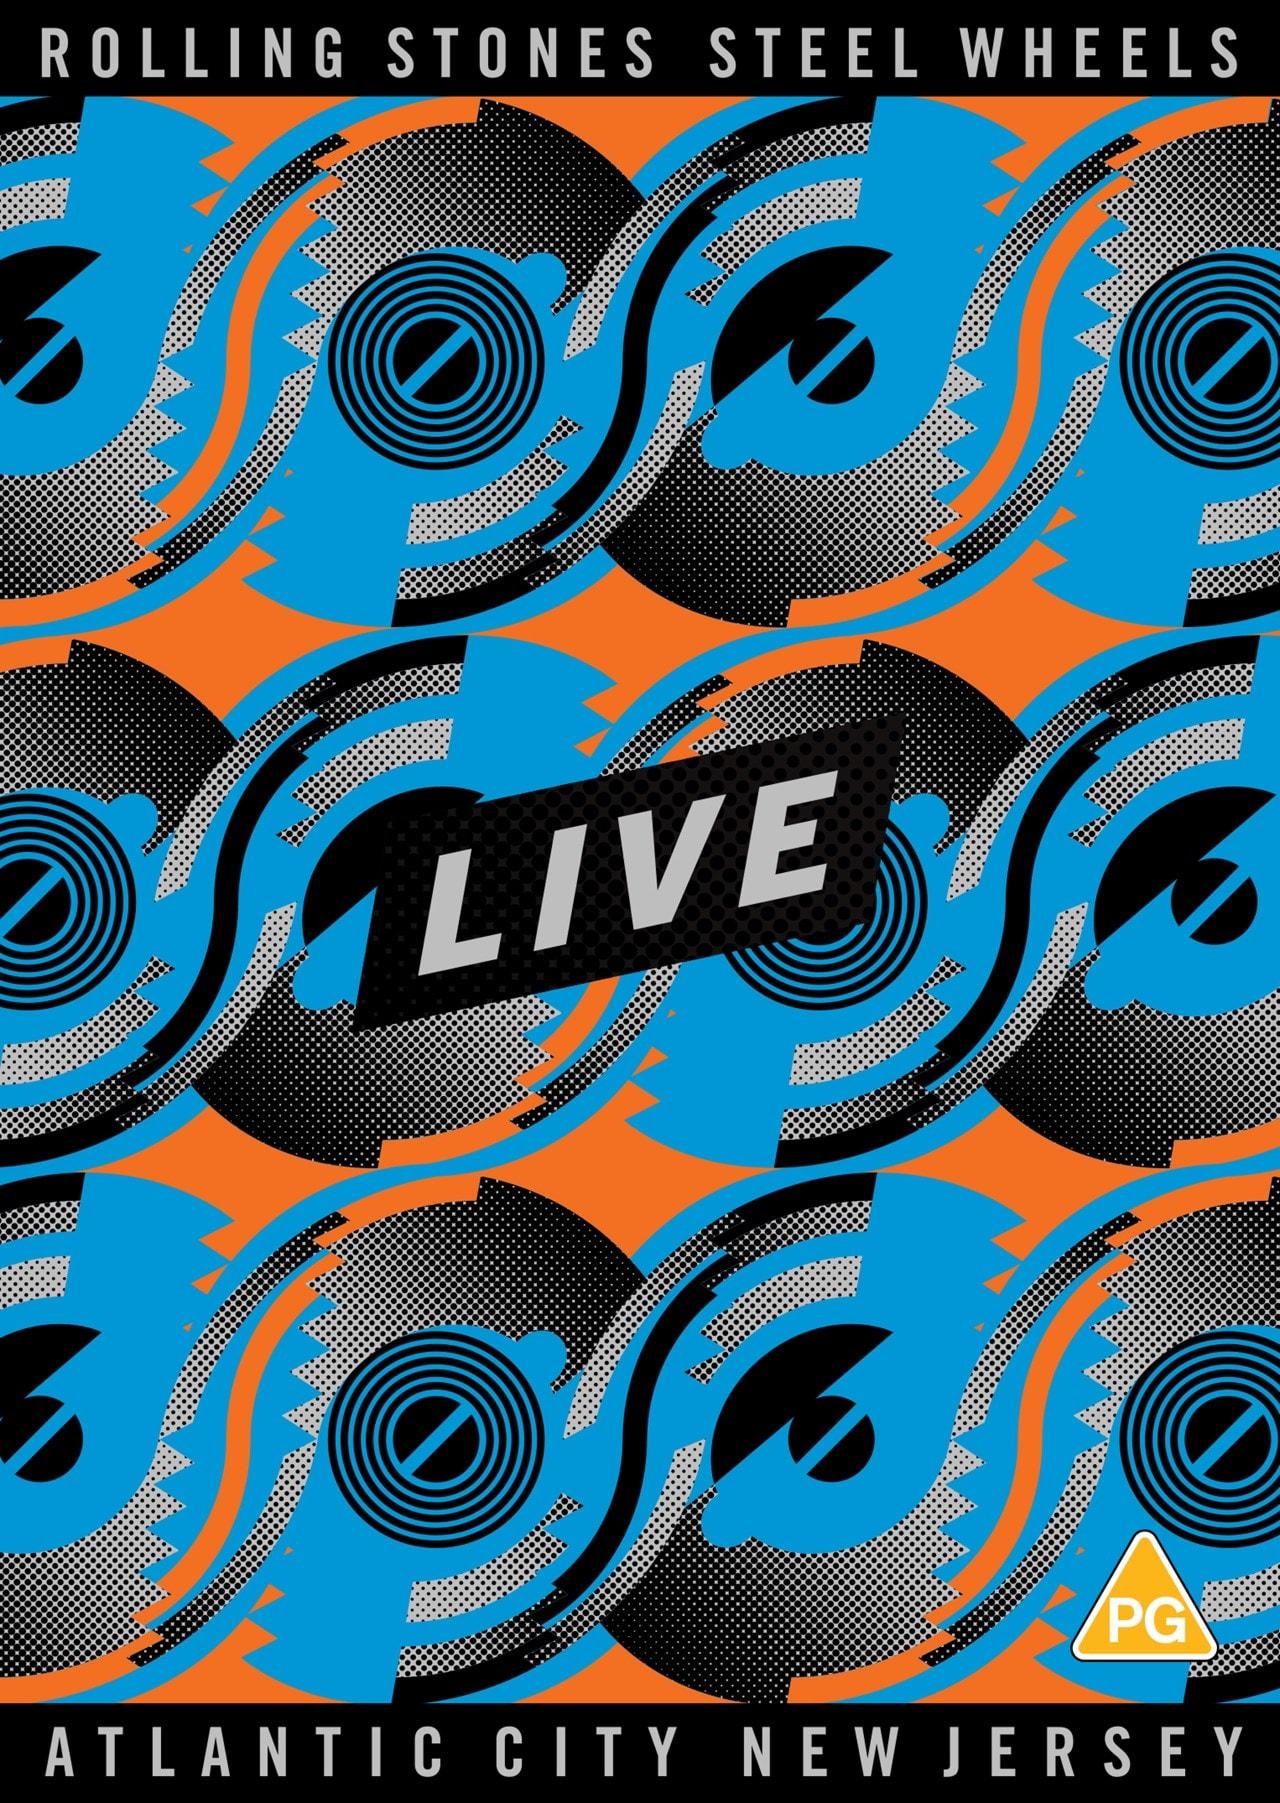 The Rolling Stones: Steel Wheels Live - Atlantic City, New Jersey - 2